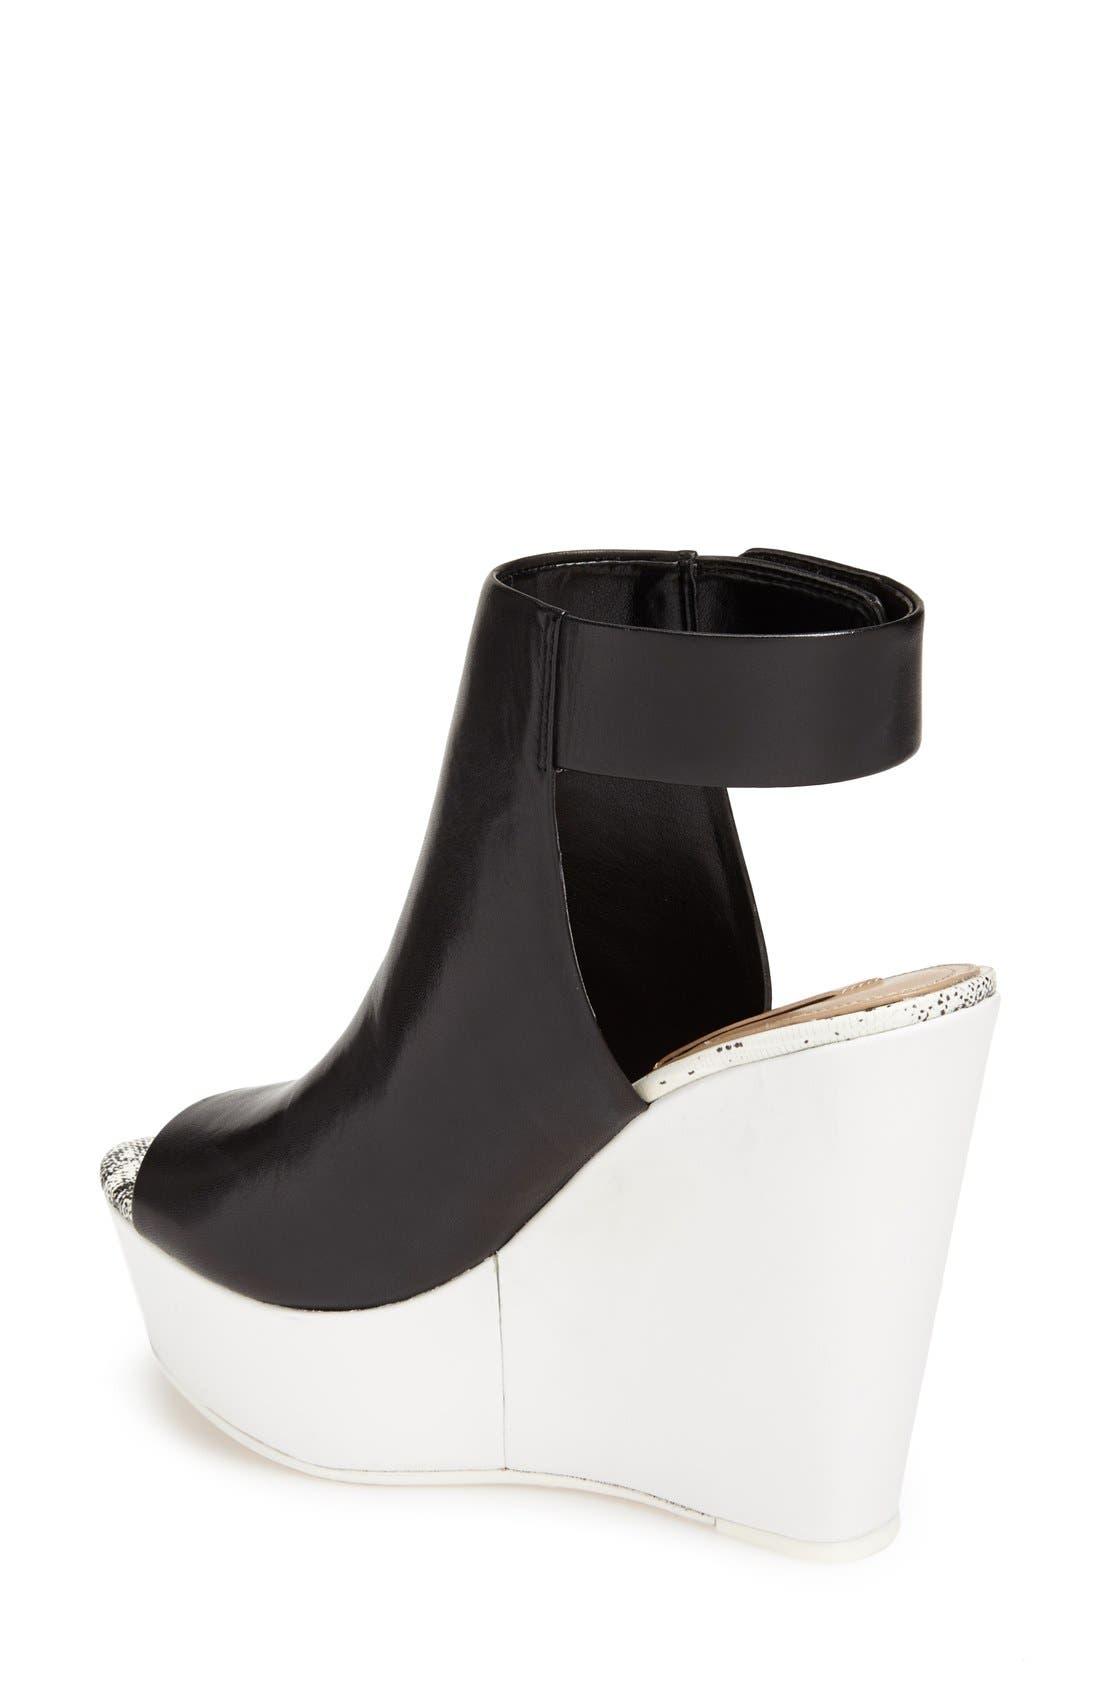 Alternate Image 2  - BCBGMAXAZRIA 'Ma-Cue' Peep Toe Leather Wedge Sandal (Women)